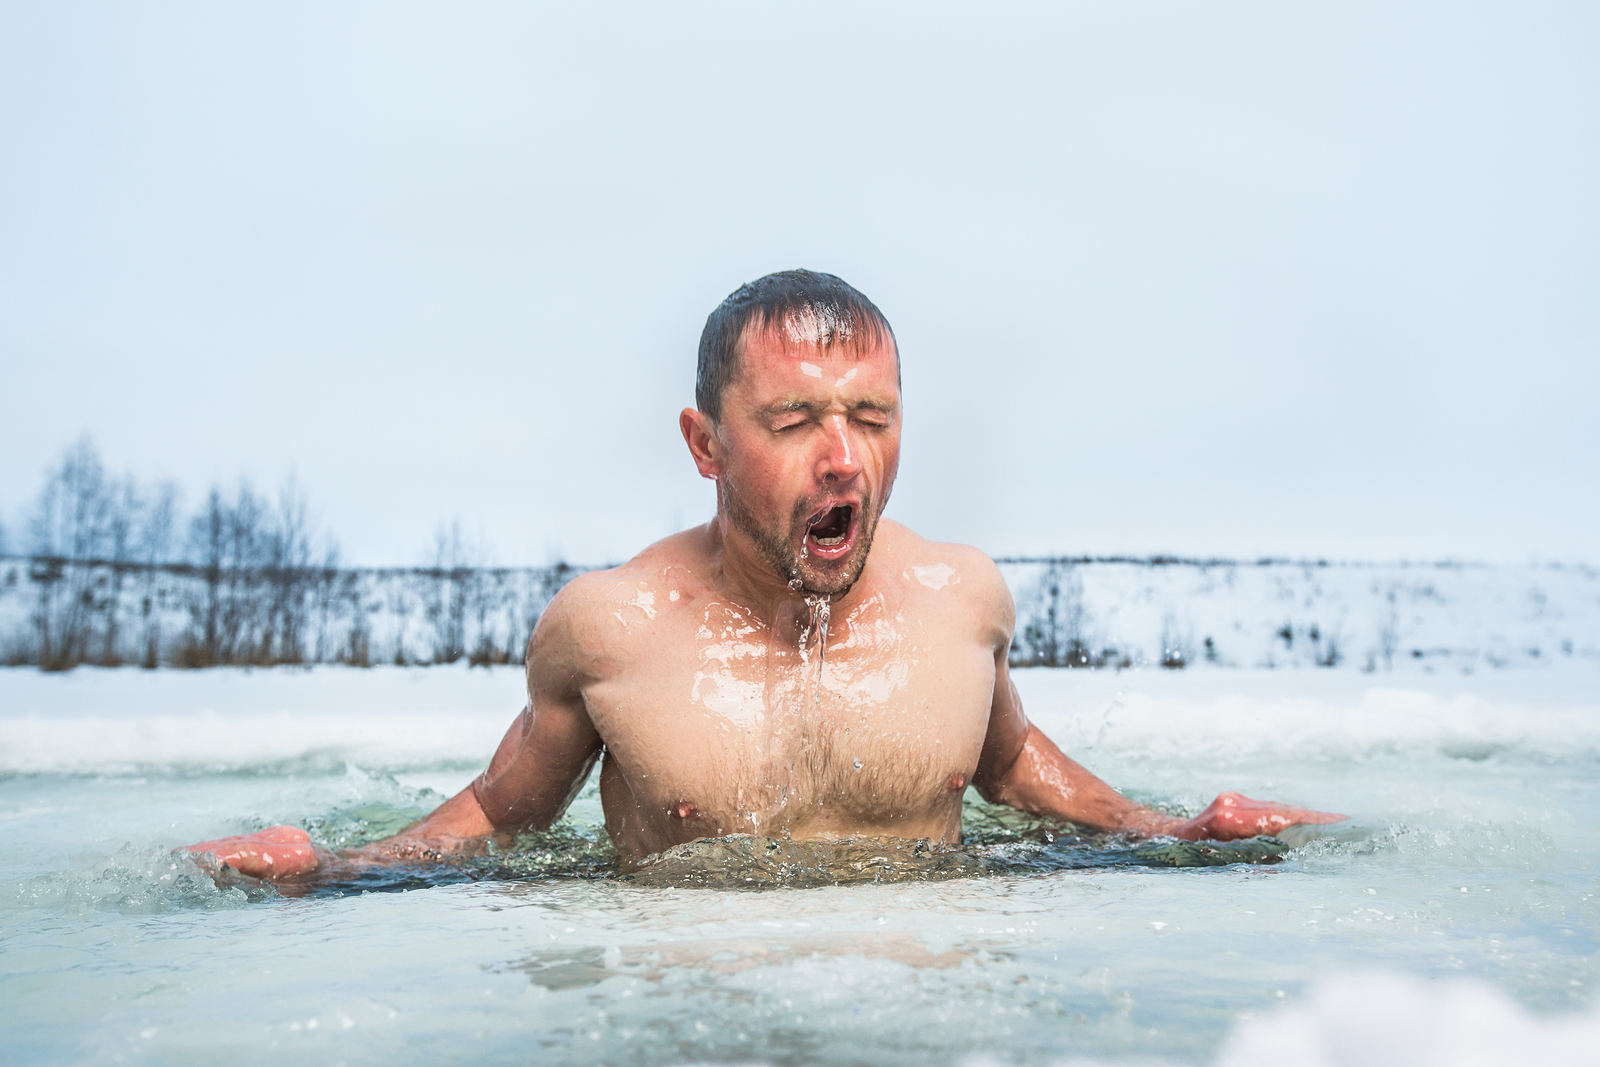 bigstock-young-man-swimming-in-the-wint-150549422.jpg